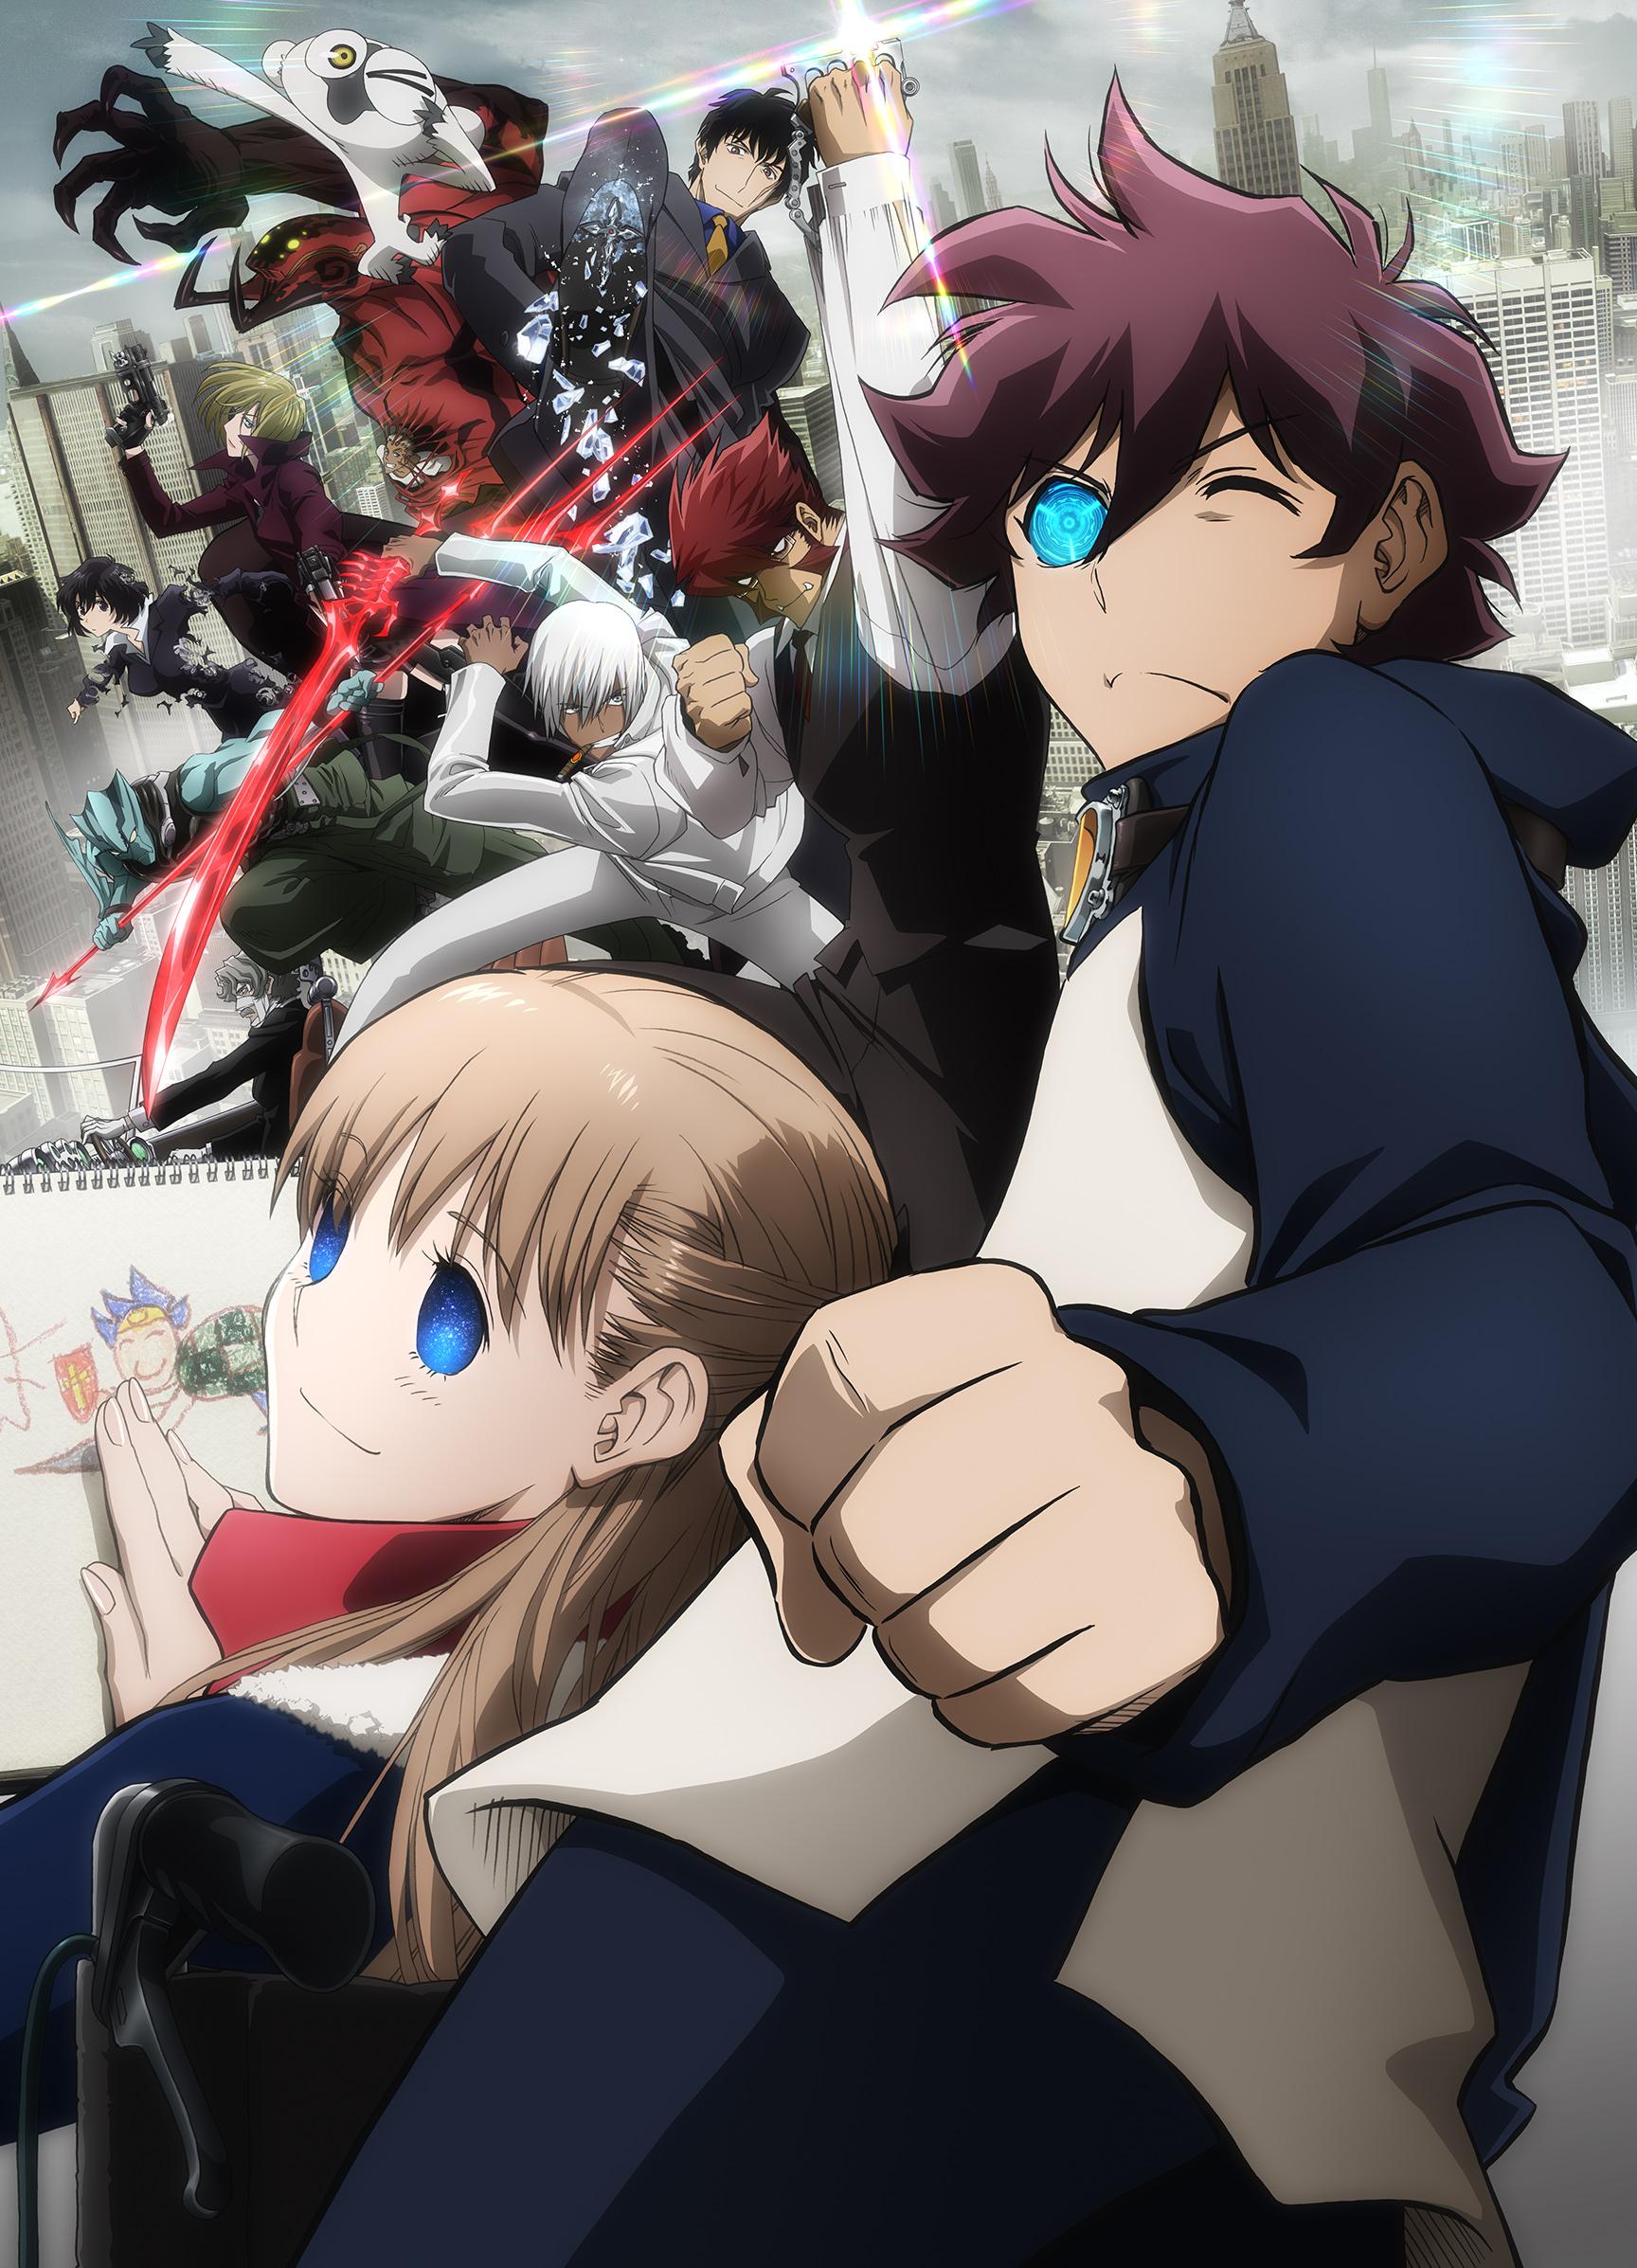 Kekkai Sensen & Beyond 12/12 + Ova [HD 720p – 1080p] [Sub Español, Ingles] [MEGA – Mediafire]